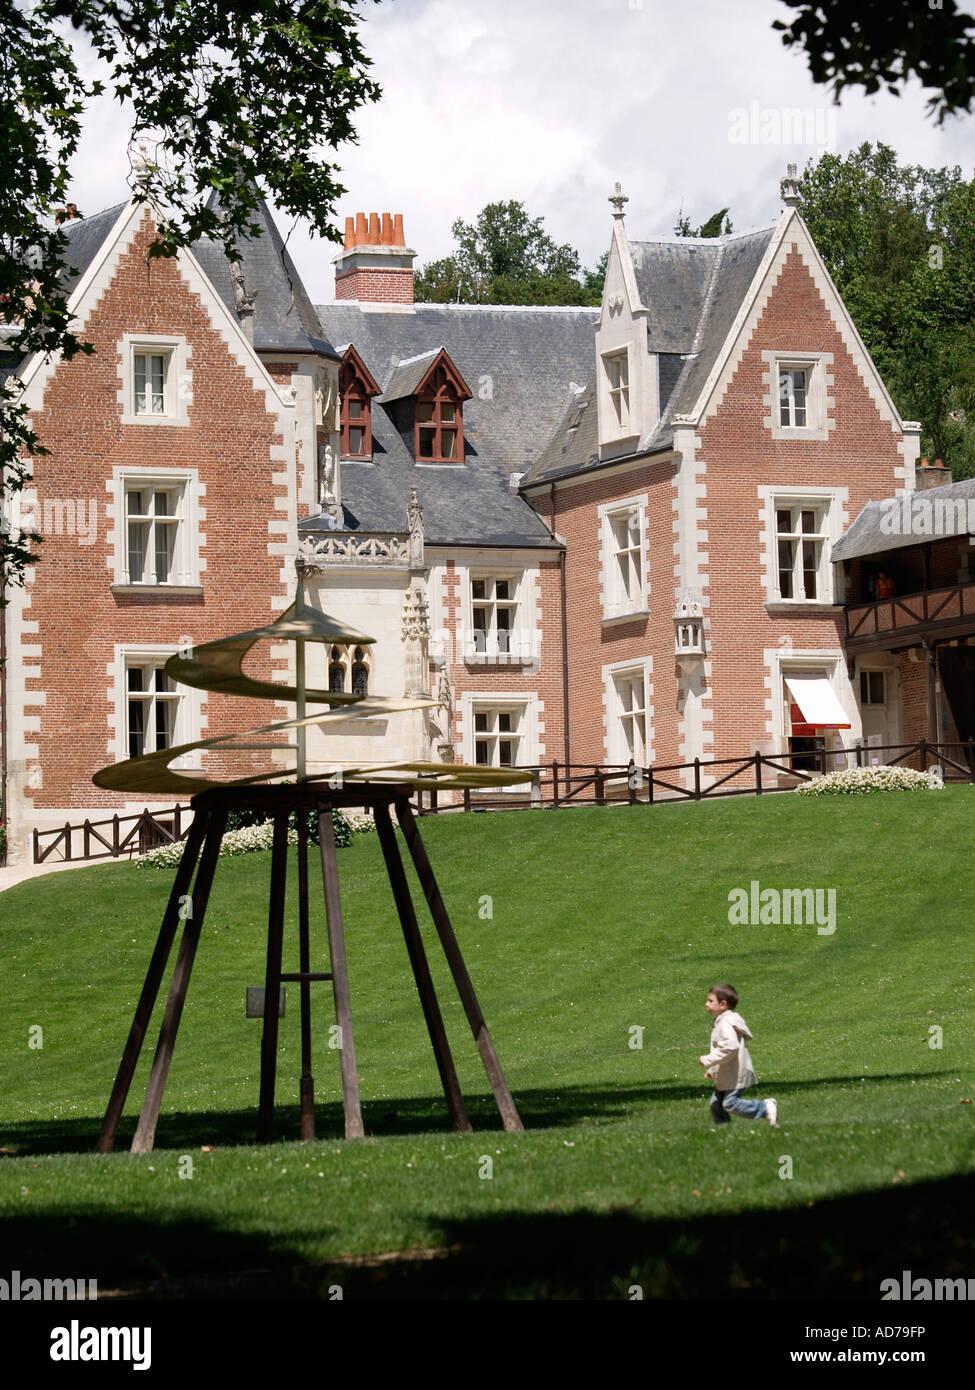 Leonardo Da Vinci Haus das chateau du clos luce in amboise ist das haus, wo leonardo da